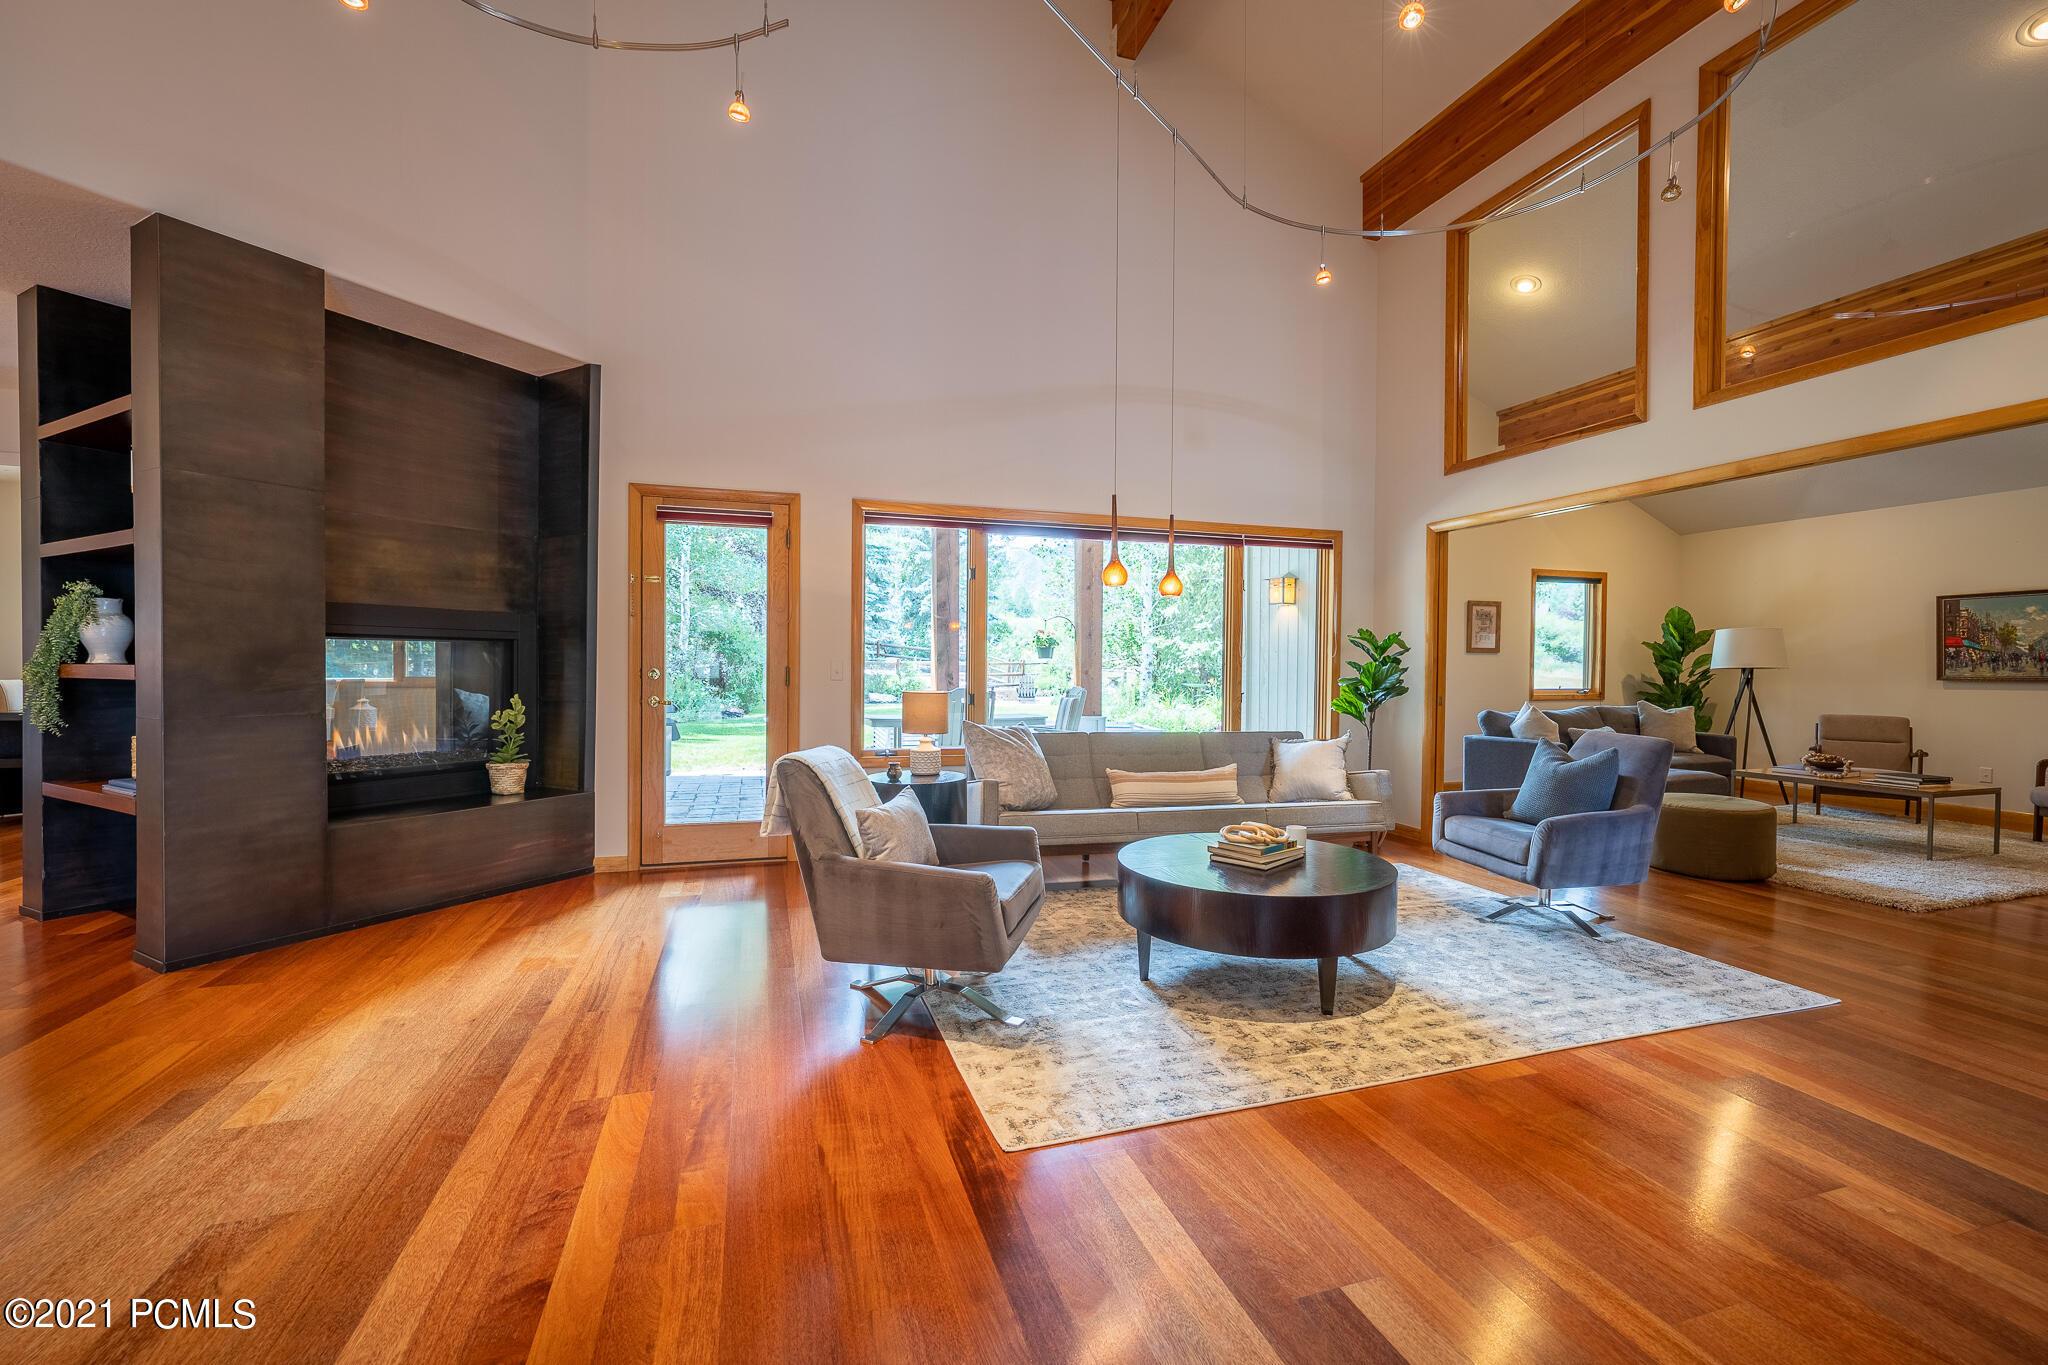 1201 Cutter Lane Lane, Park City, Utah 84098, 5 Bedrooms Bedrooms, ,4 BathroomsBathrooms,Single Family,For Sale,Cutter Lane,12102927